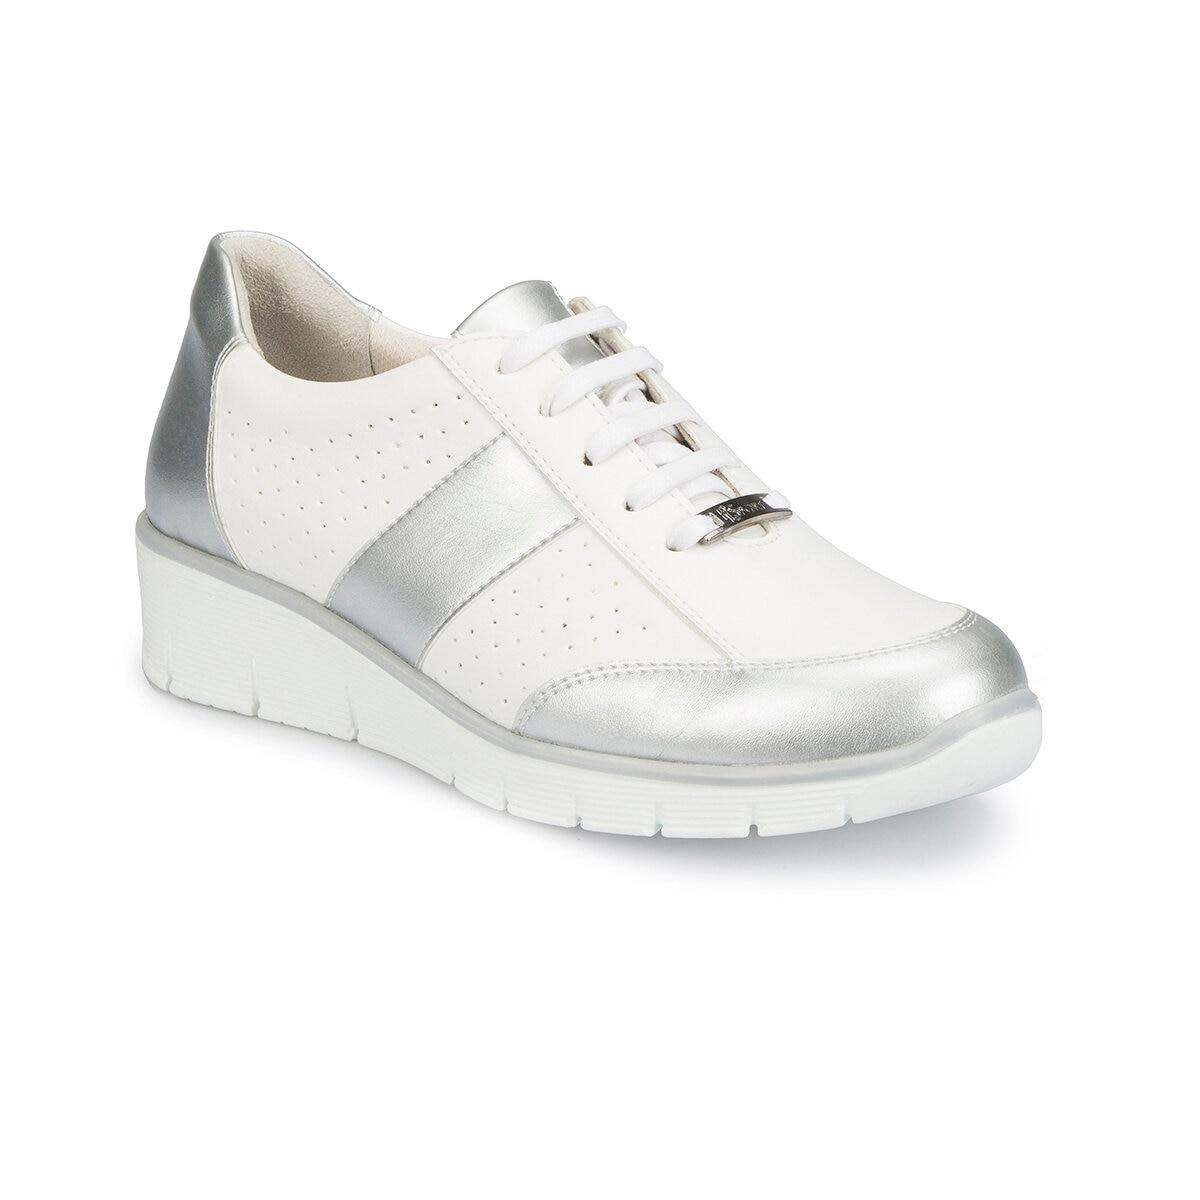 FLO 81.111313.Z Silver Women Basic Comfort Polaris